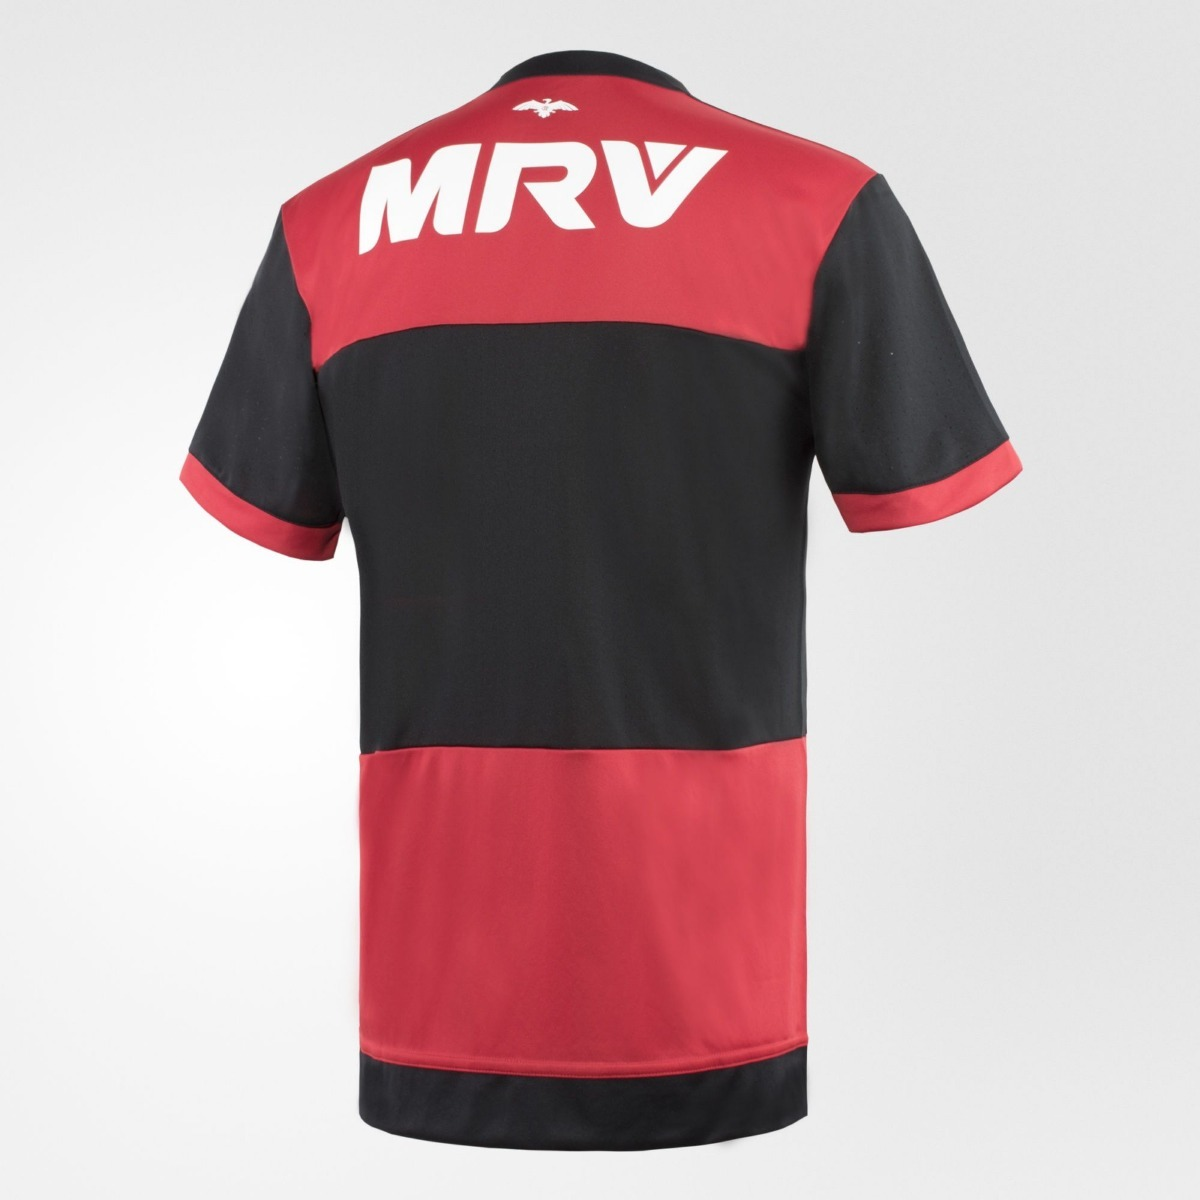 d82f69d63a286 uniforme infantil camisa e shorts flamengo oficial adidas. Carregando zoom.